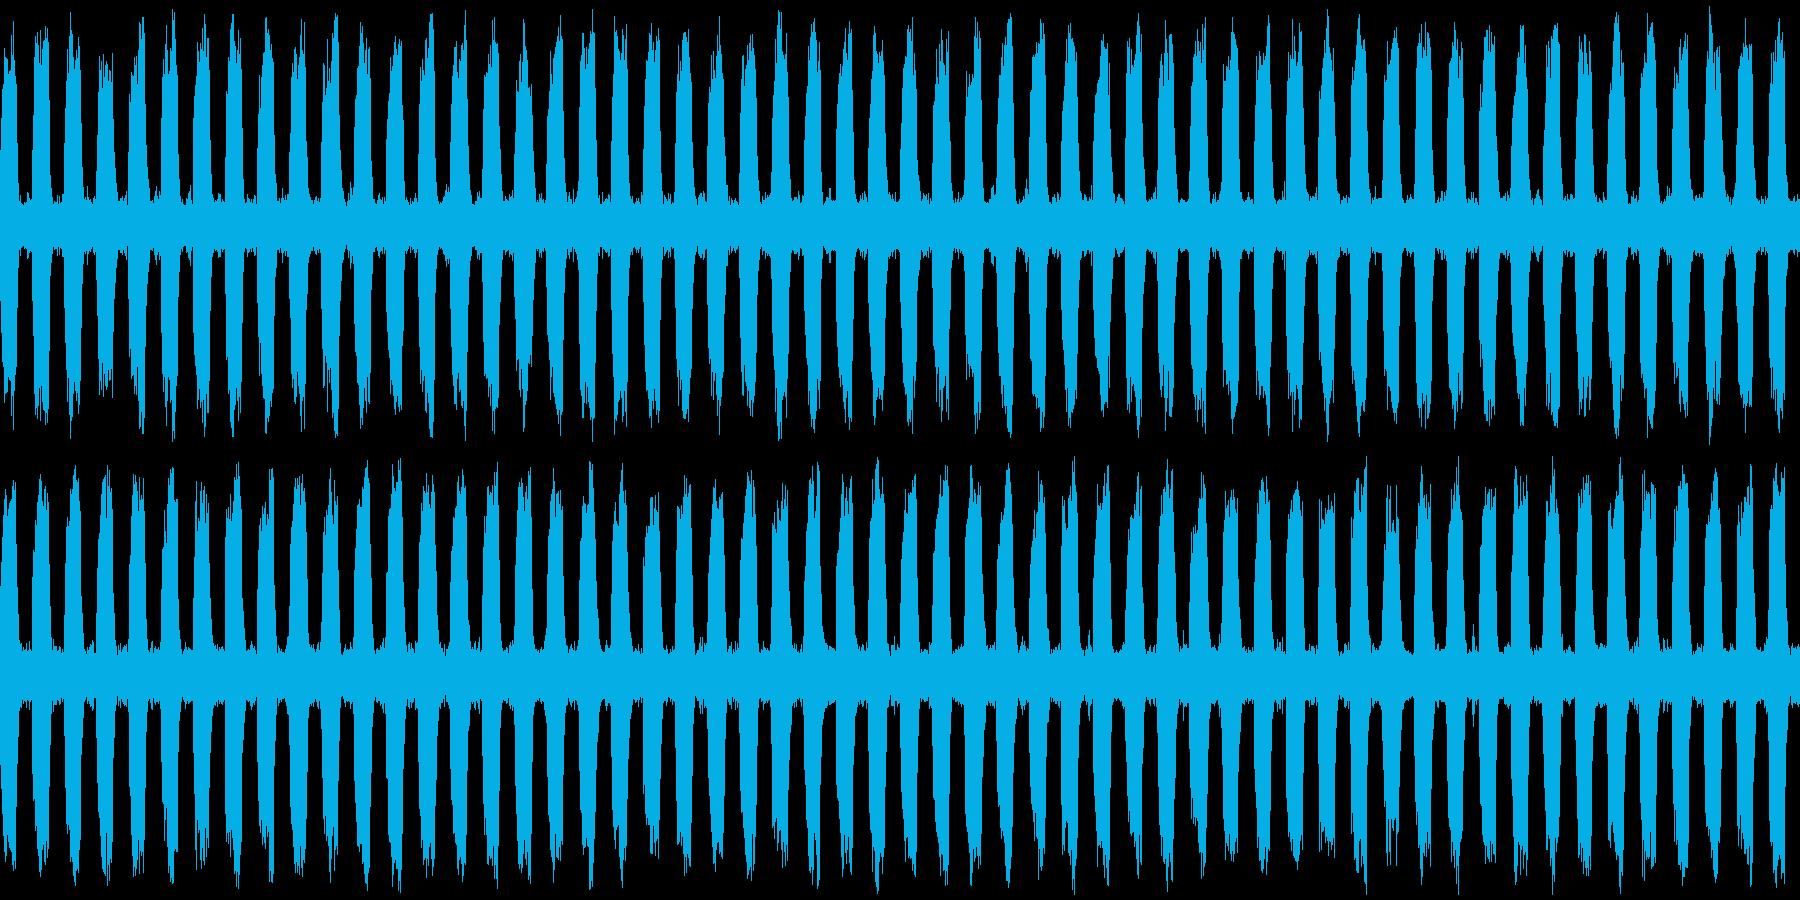 SF_緊急事態_警報_エマージェンシー1の再生済みの波形